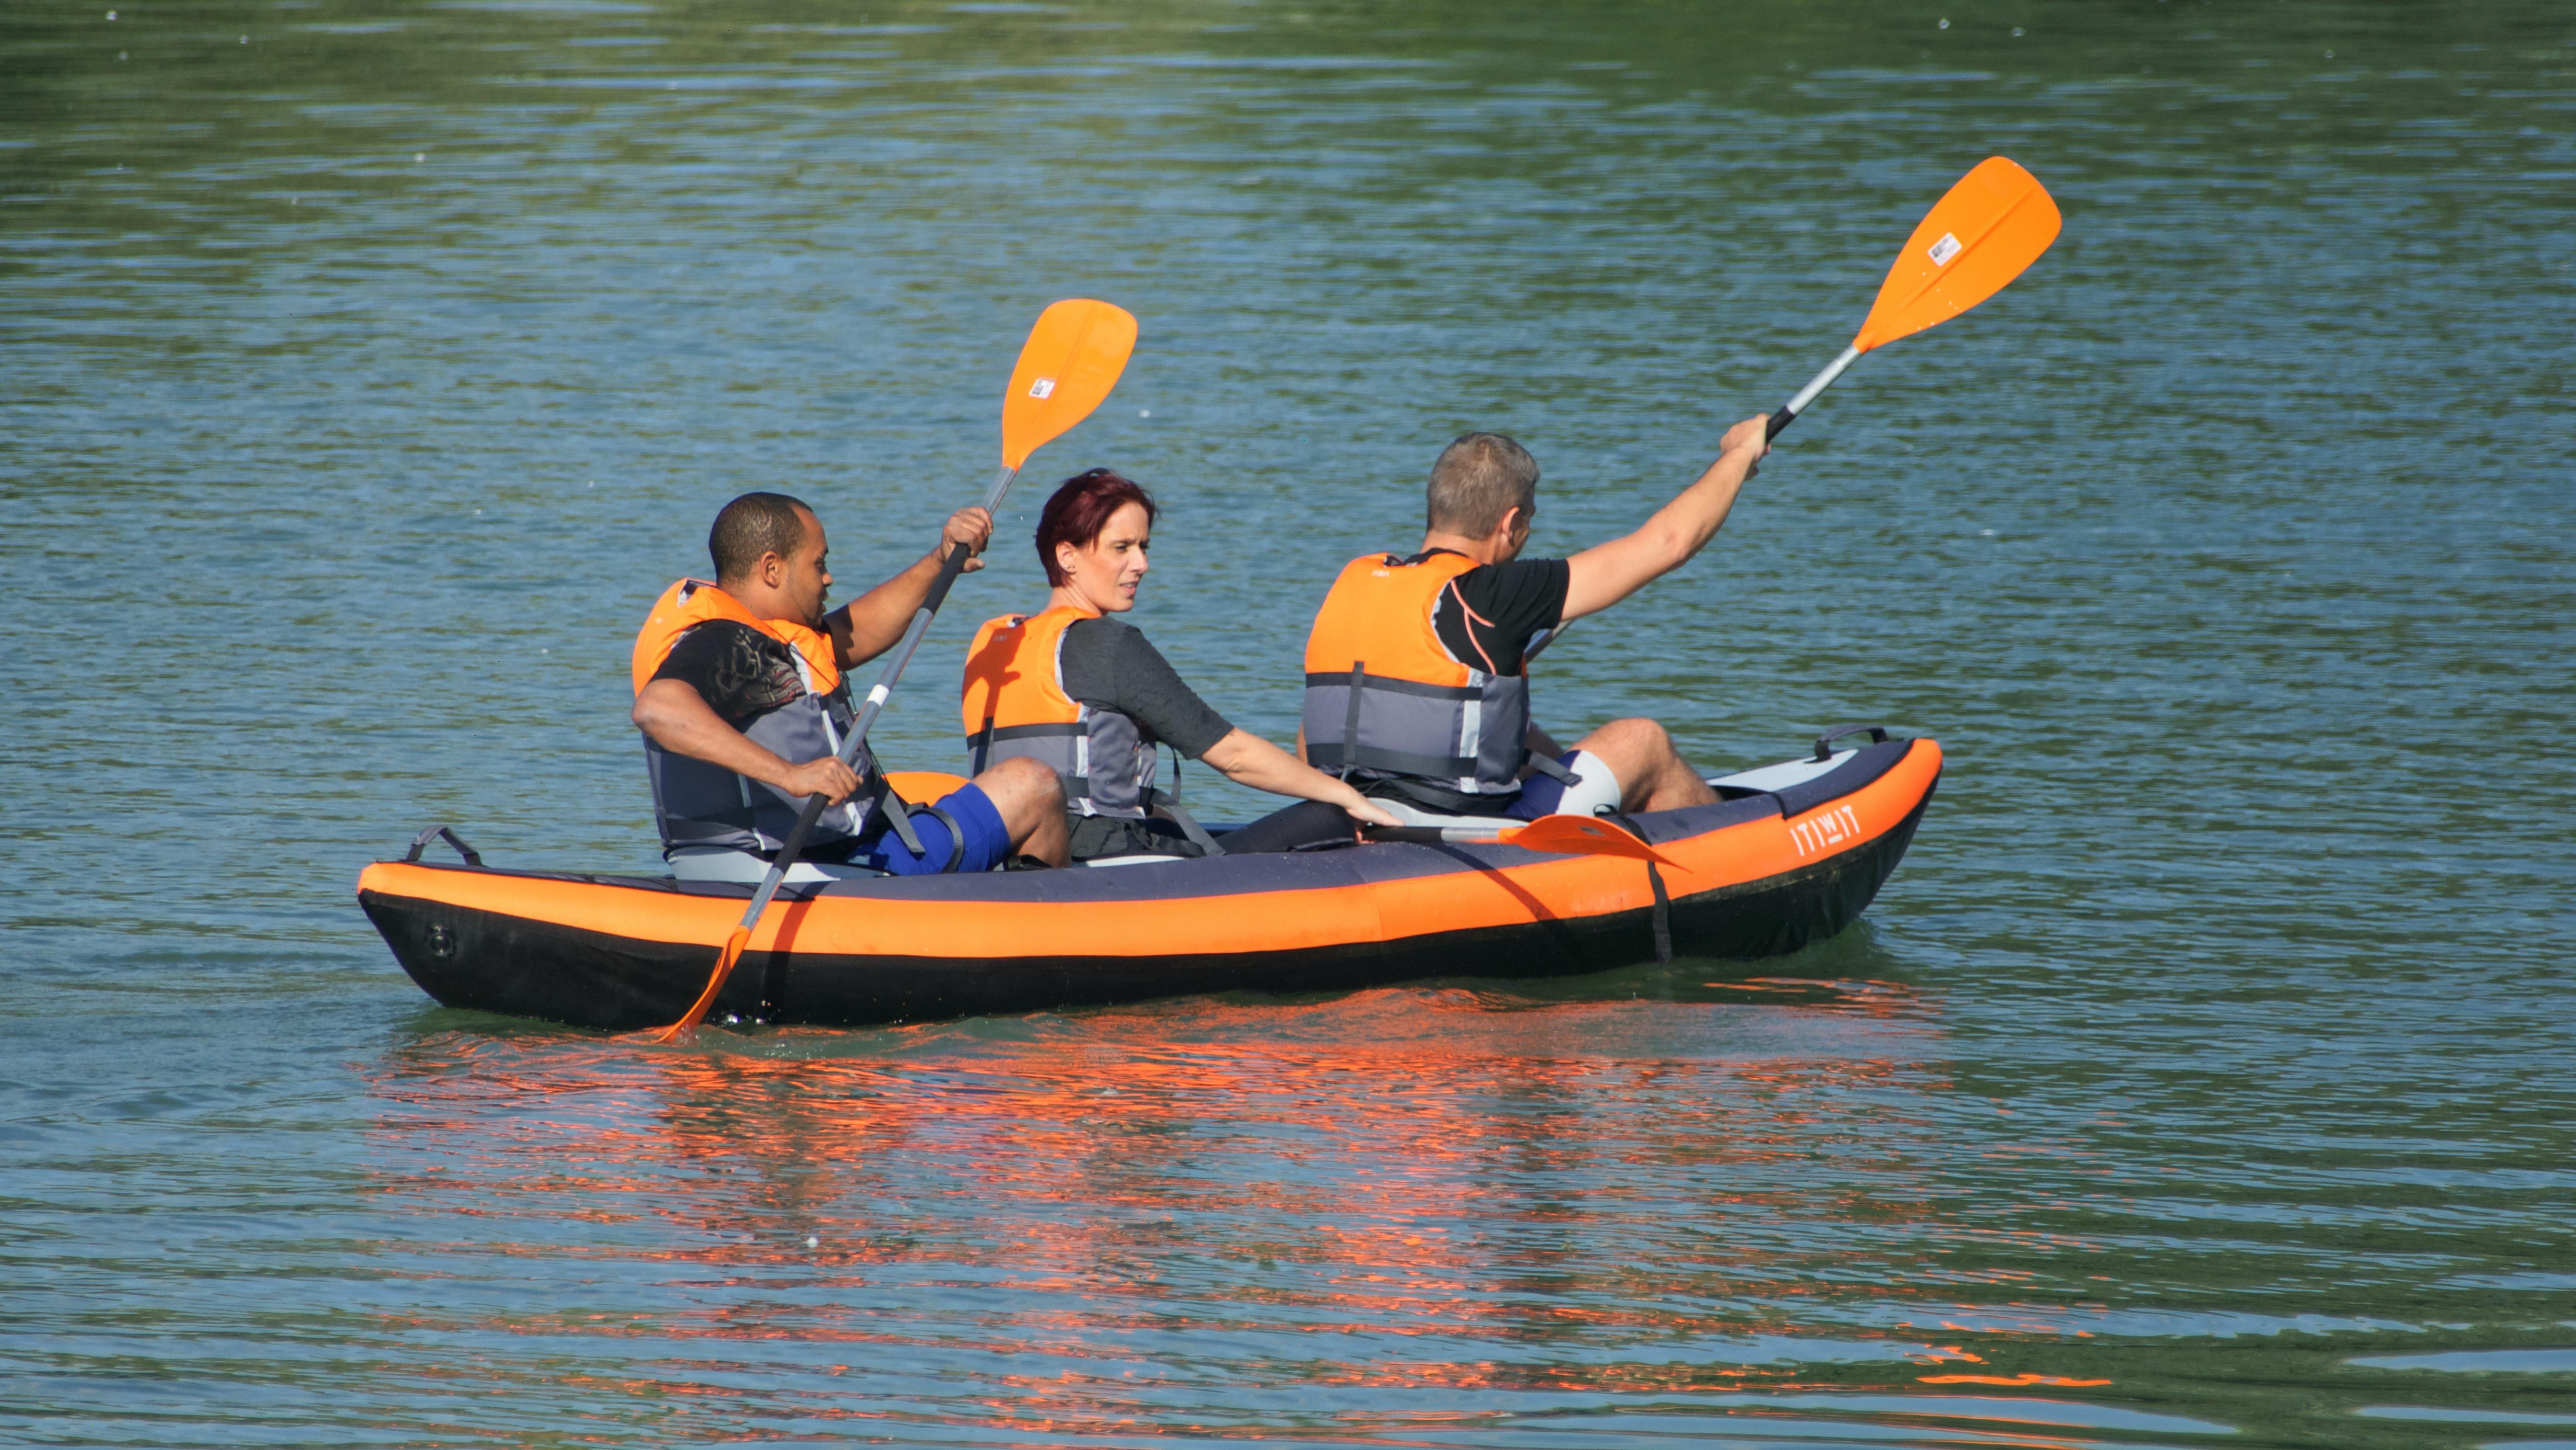 Three people paddling on a kayak.